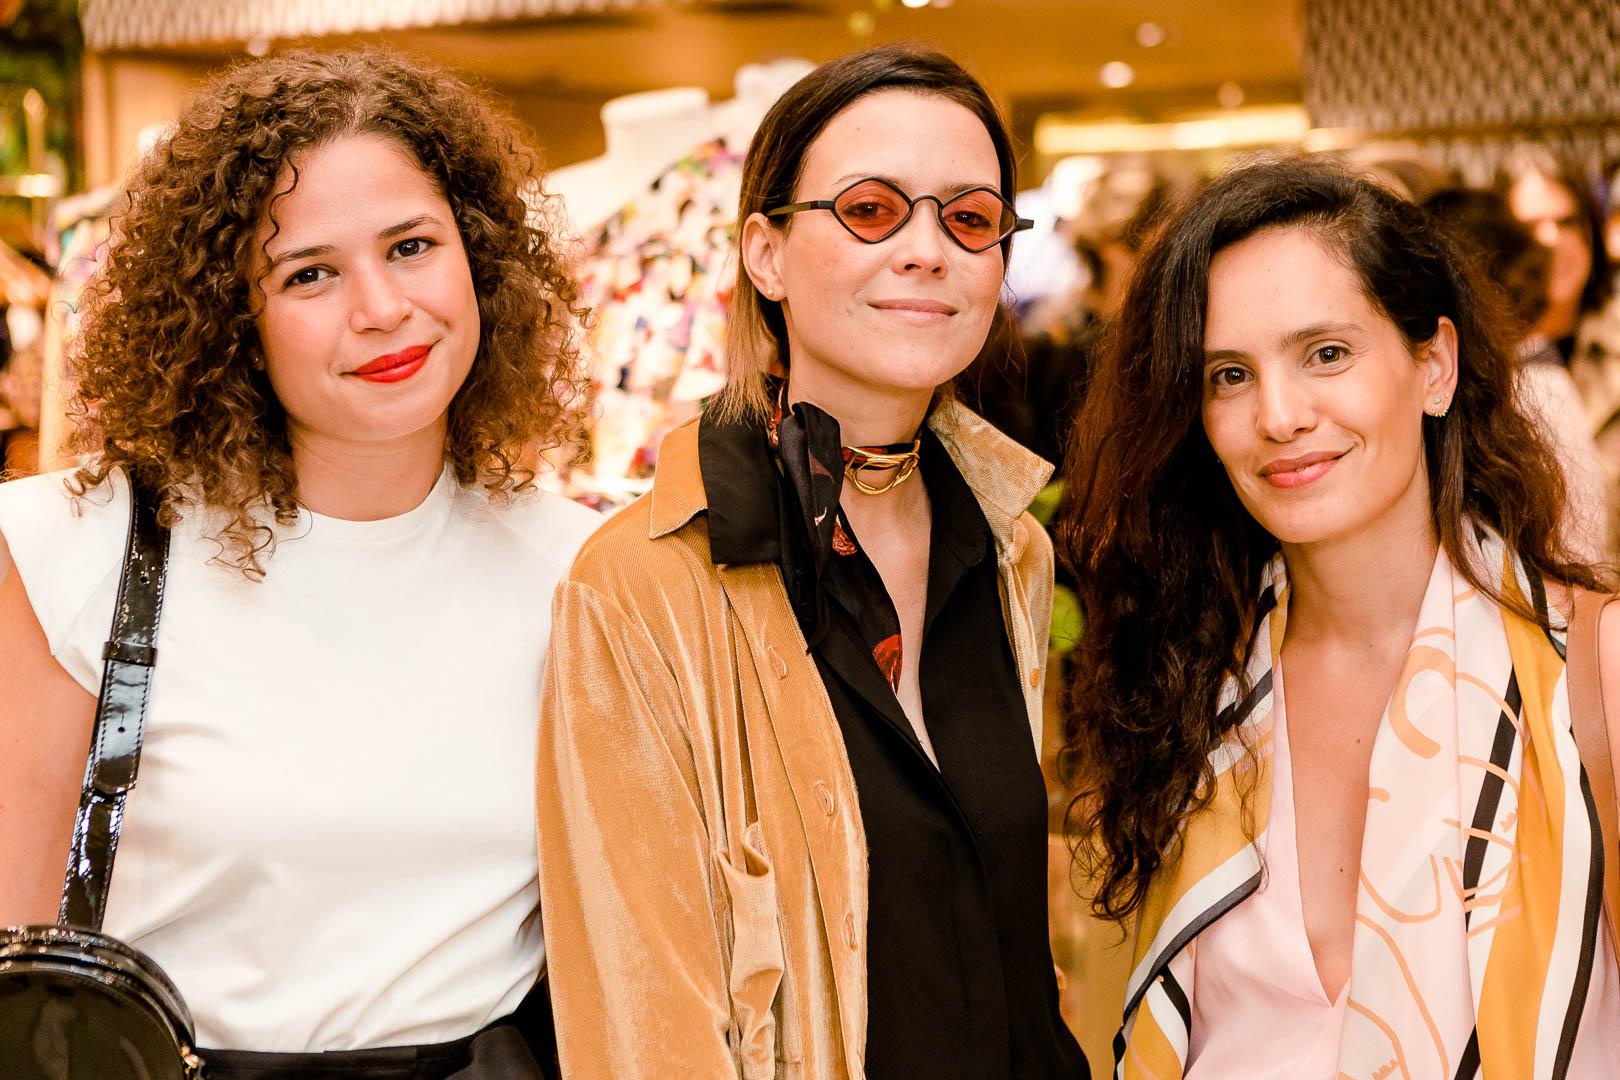 Carol Pinton Natasha Novis e Gisa Pecego